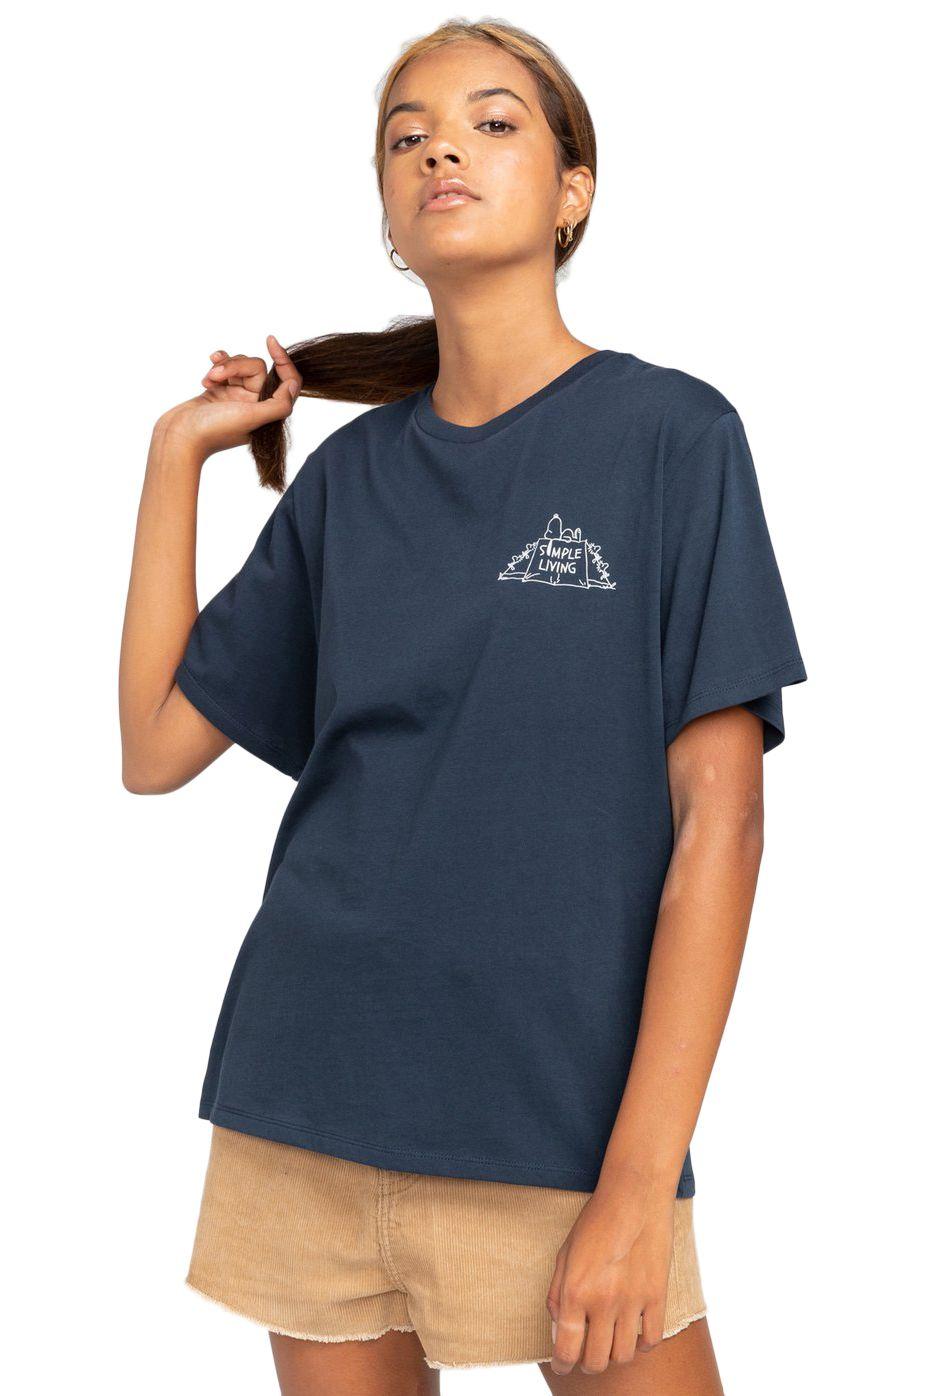 T-Shirt Element PEANUTS SIMPLE LIVIN PEANUTS Eclipse Navy